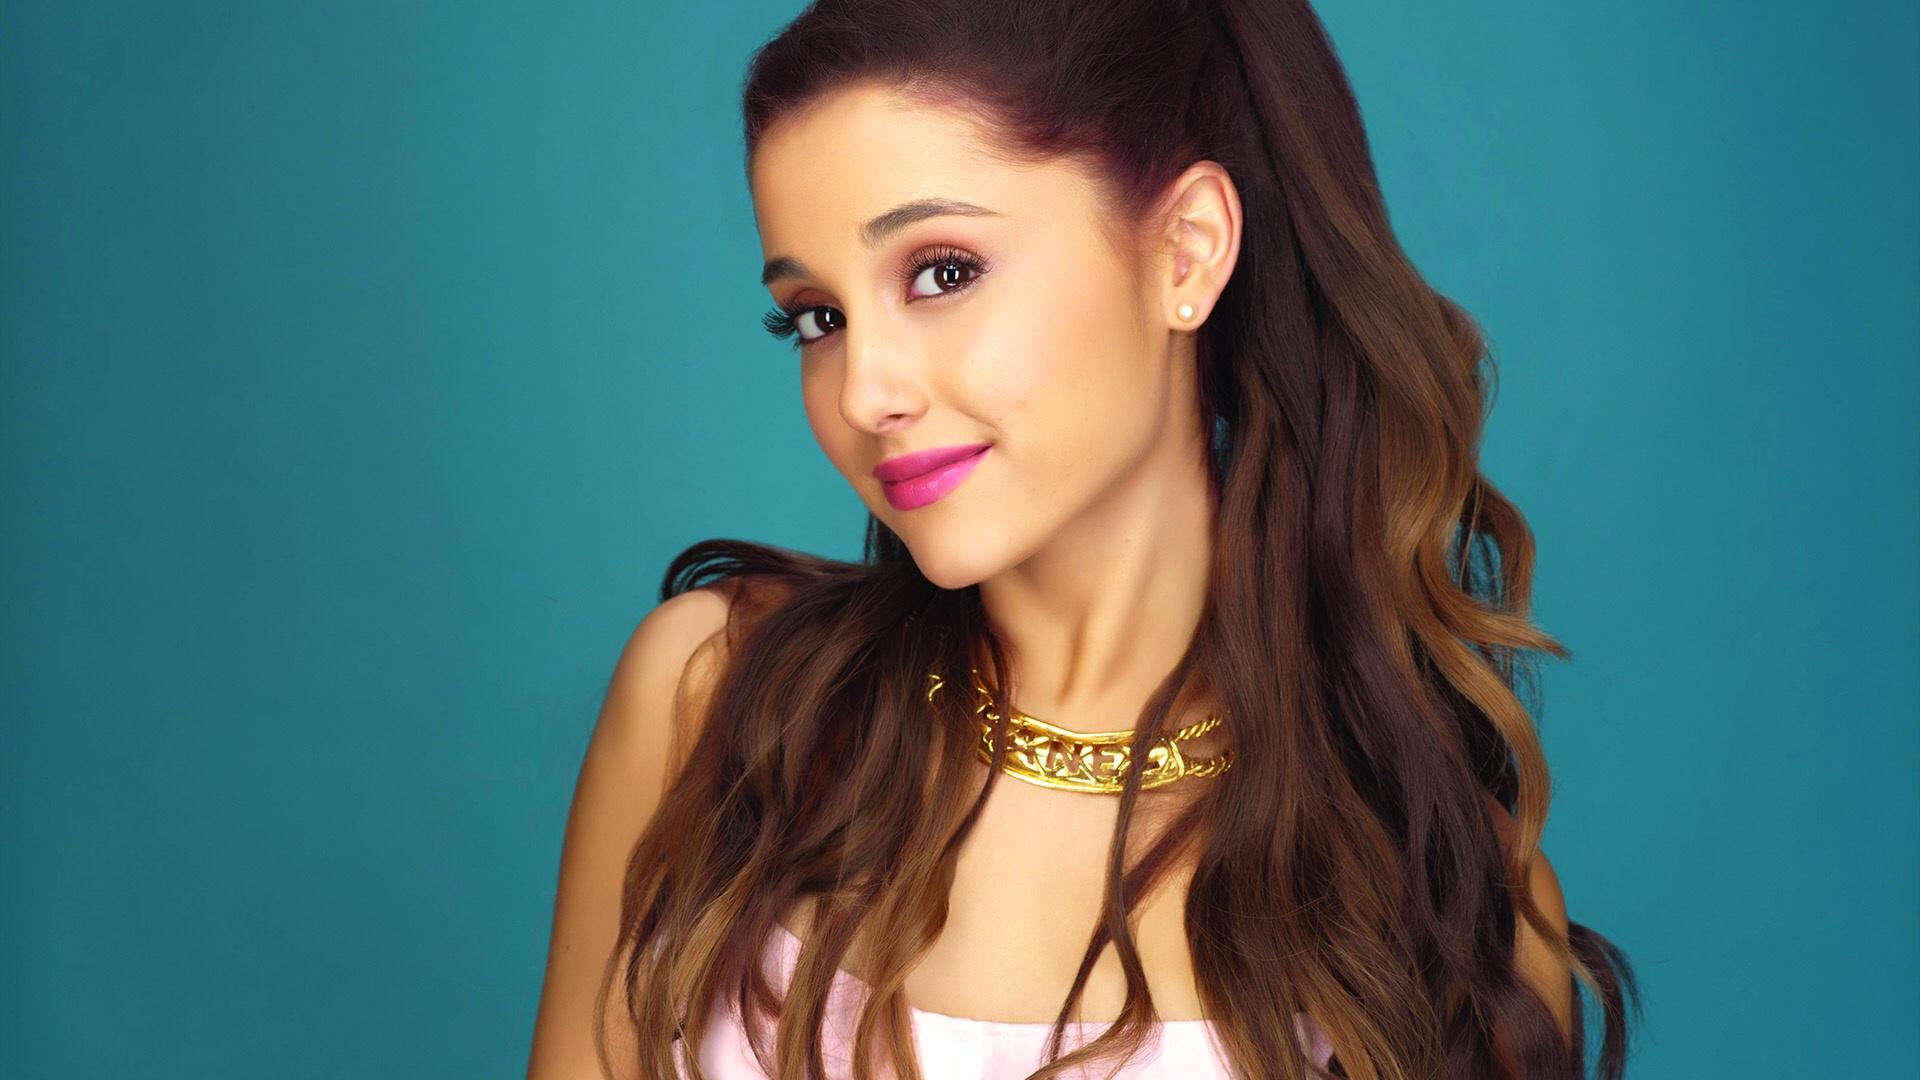 Calendario Ariana Grande 2020.Ariana Grande Tkt Point